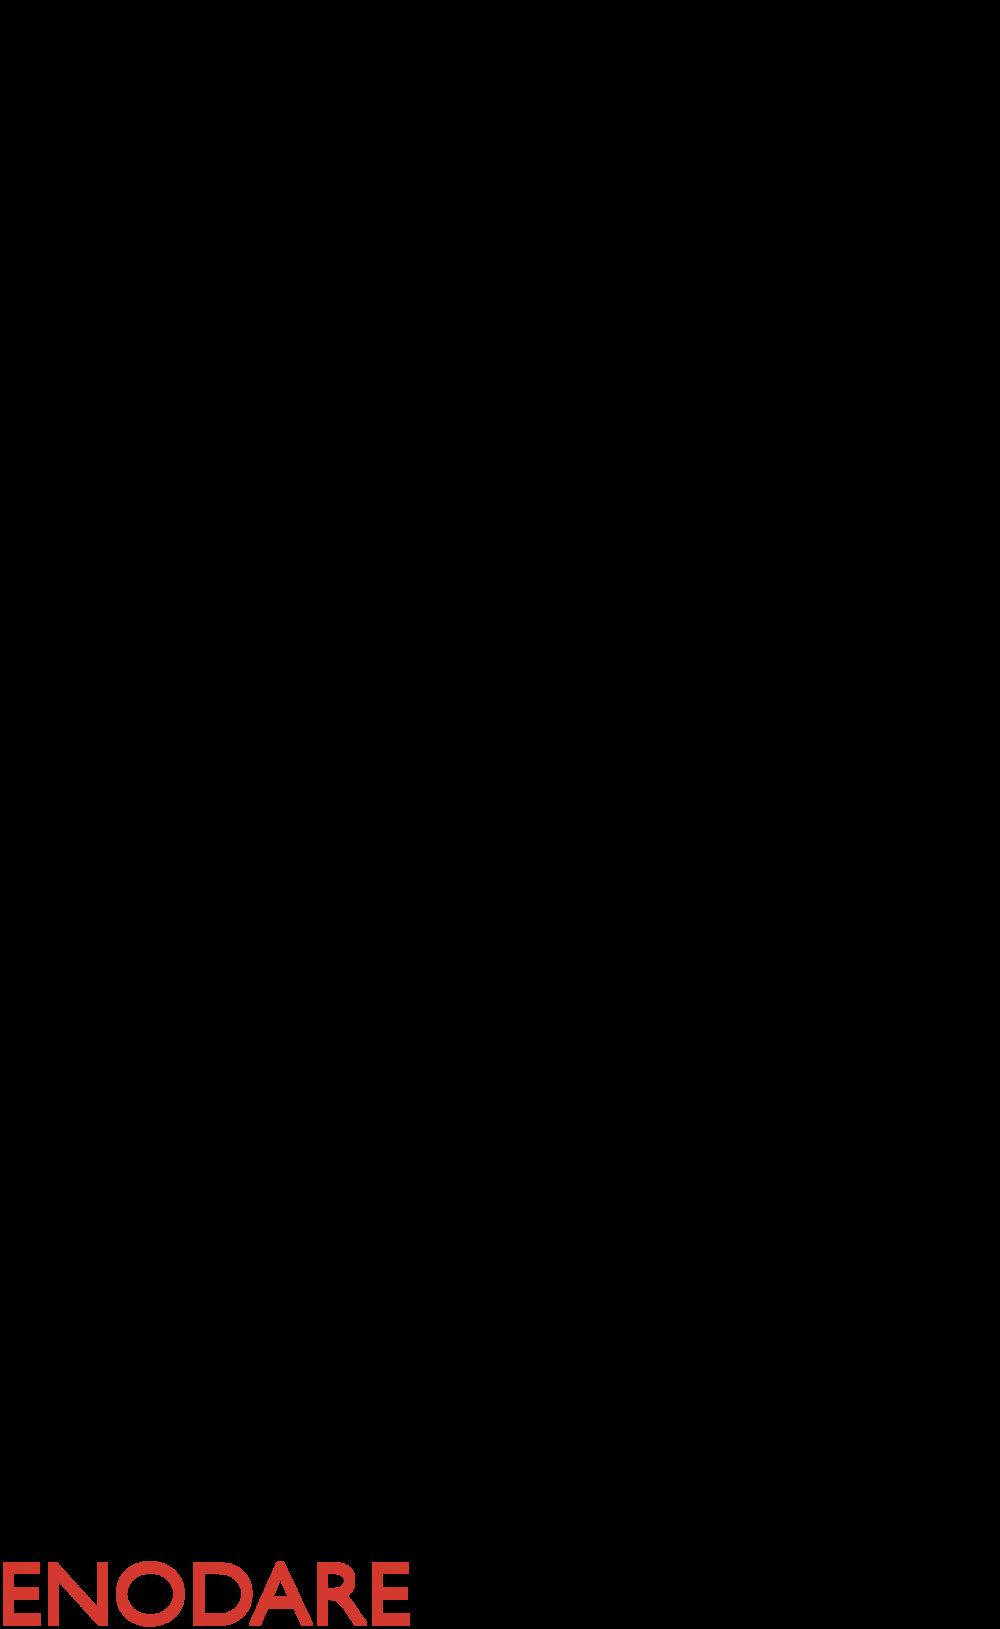 enodare logo.png